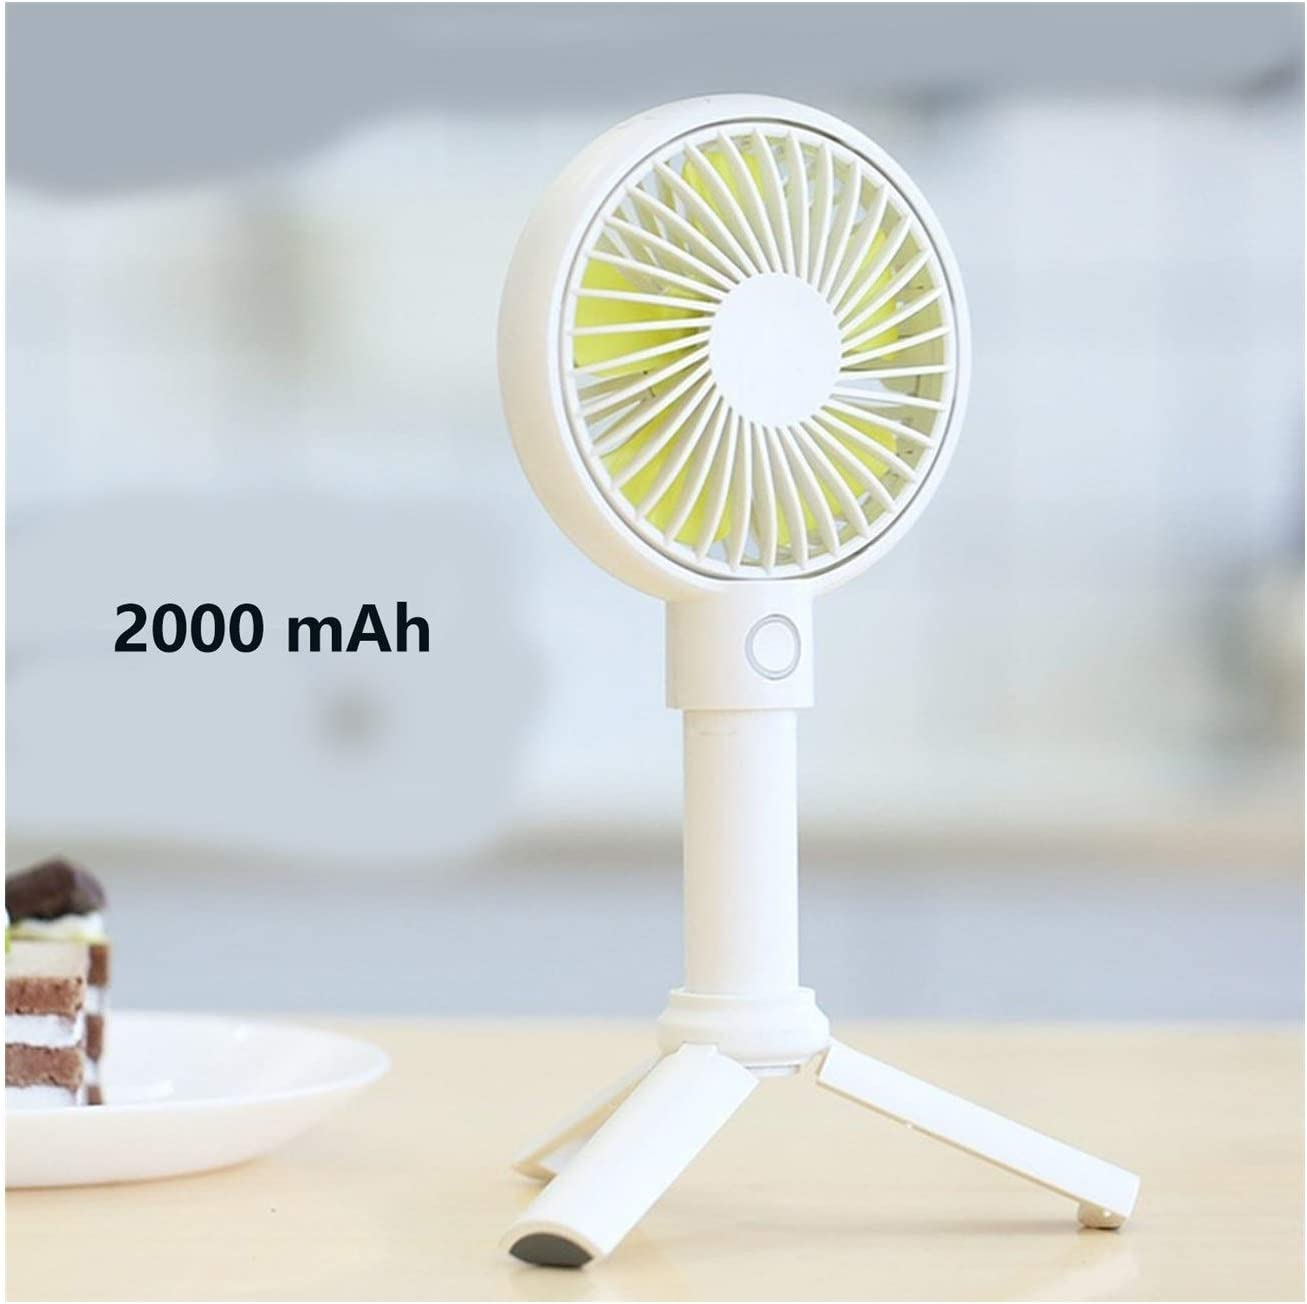 XIAOF-FEN Mini Fan Student Charging USB Handheld Fan Silent Portable Fan Dormitory Triangular Support USB Fan Color : Yellow, Size : 2000mAh Battery